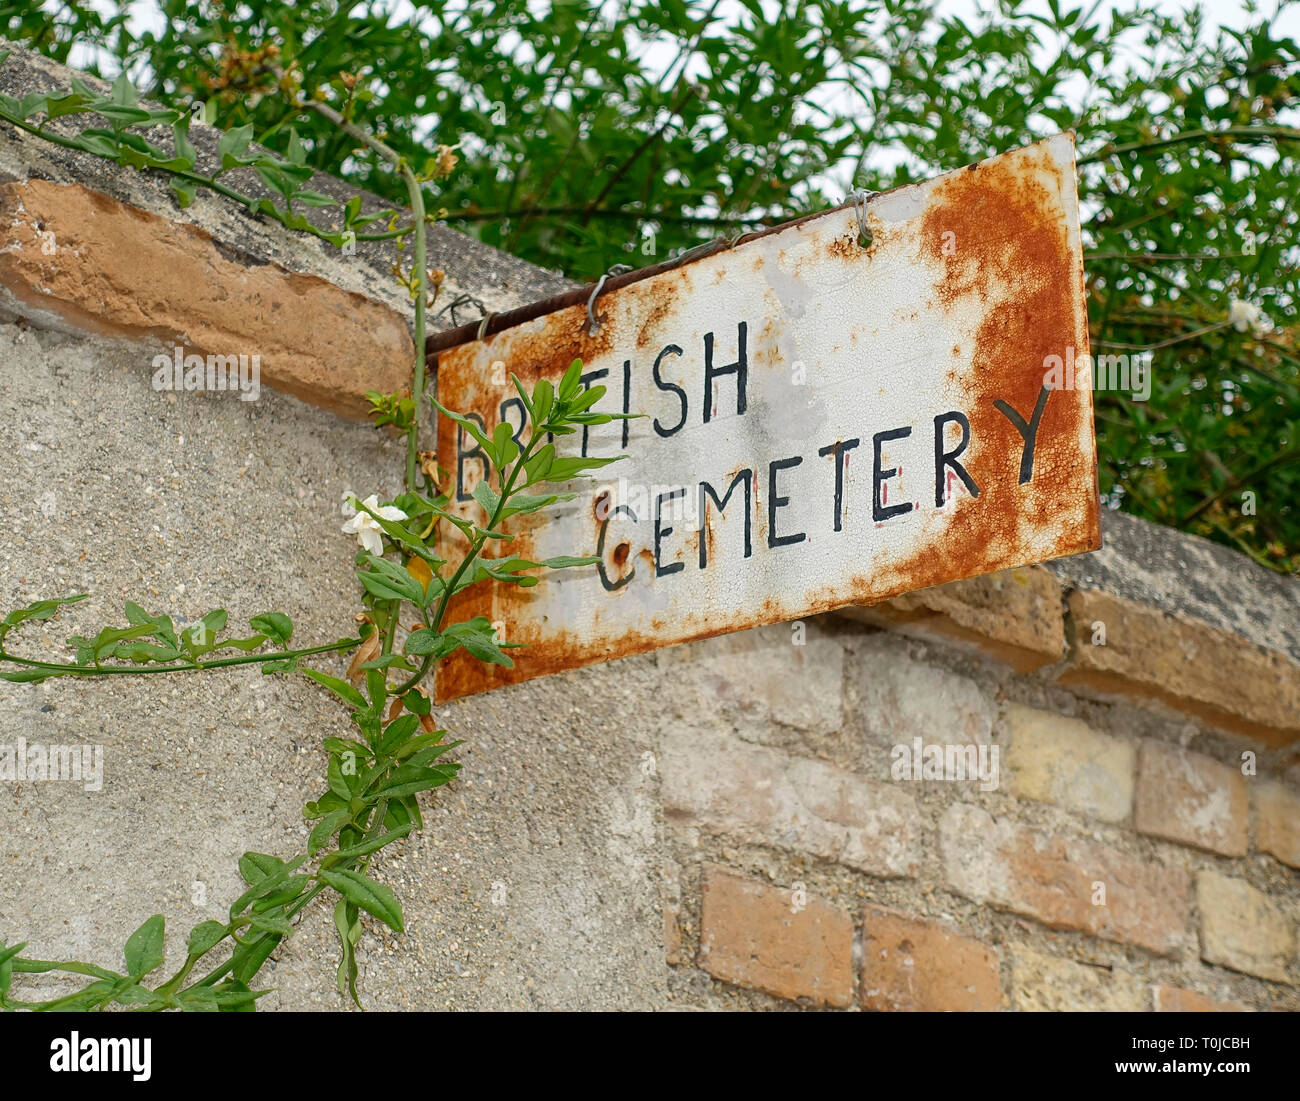 British Cemetery, Corfu, Greece - Stock Image